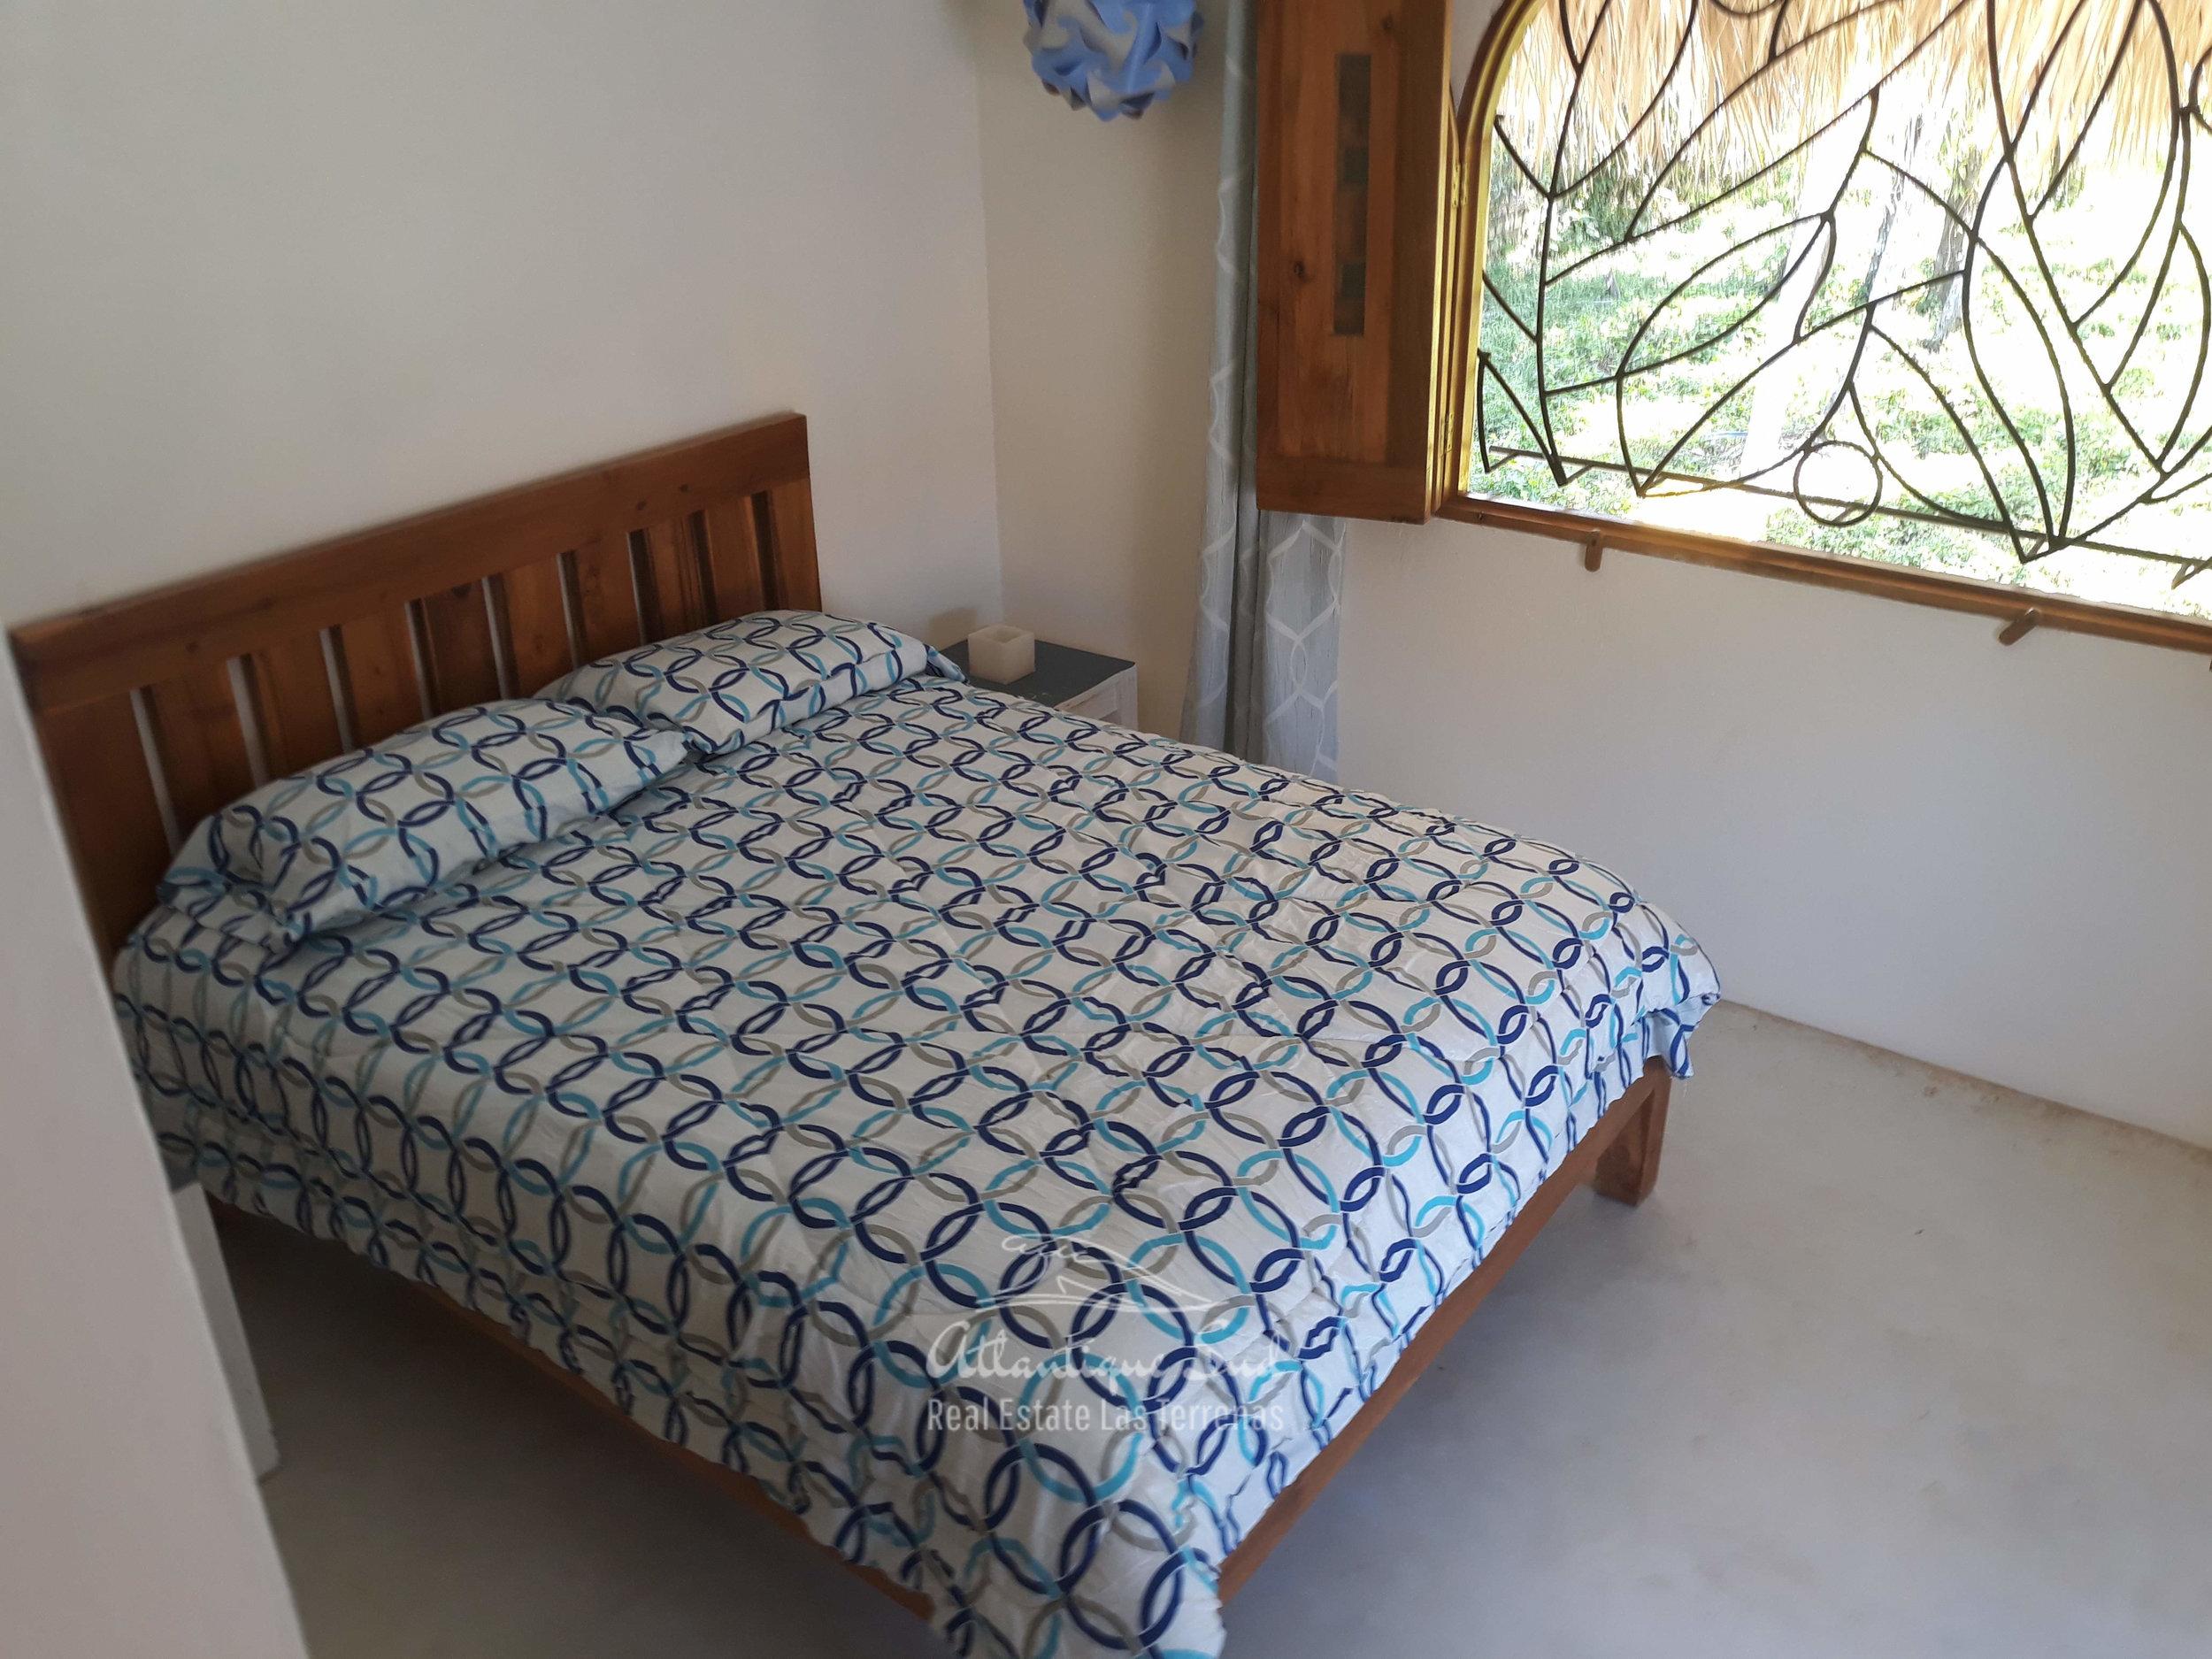 Authentic Caribbean Villa in quiet community in Real Estate Las Terrenas Atlantique Sud20.jpg